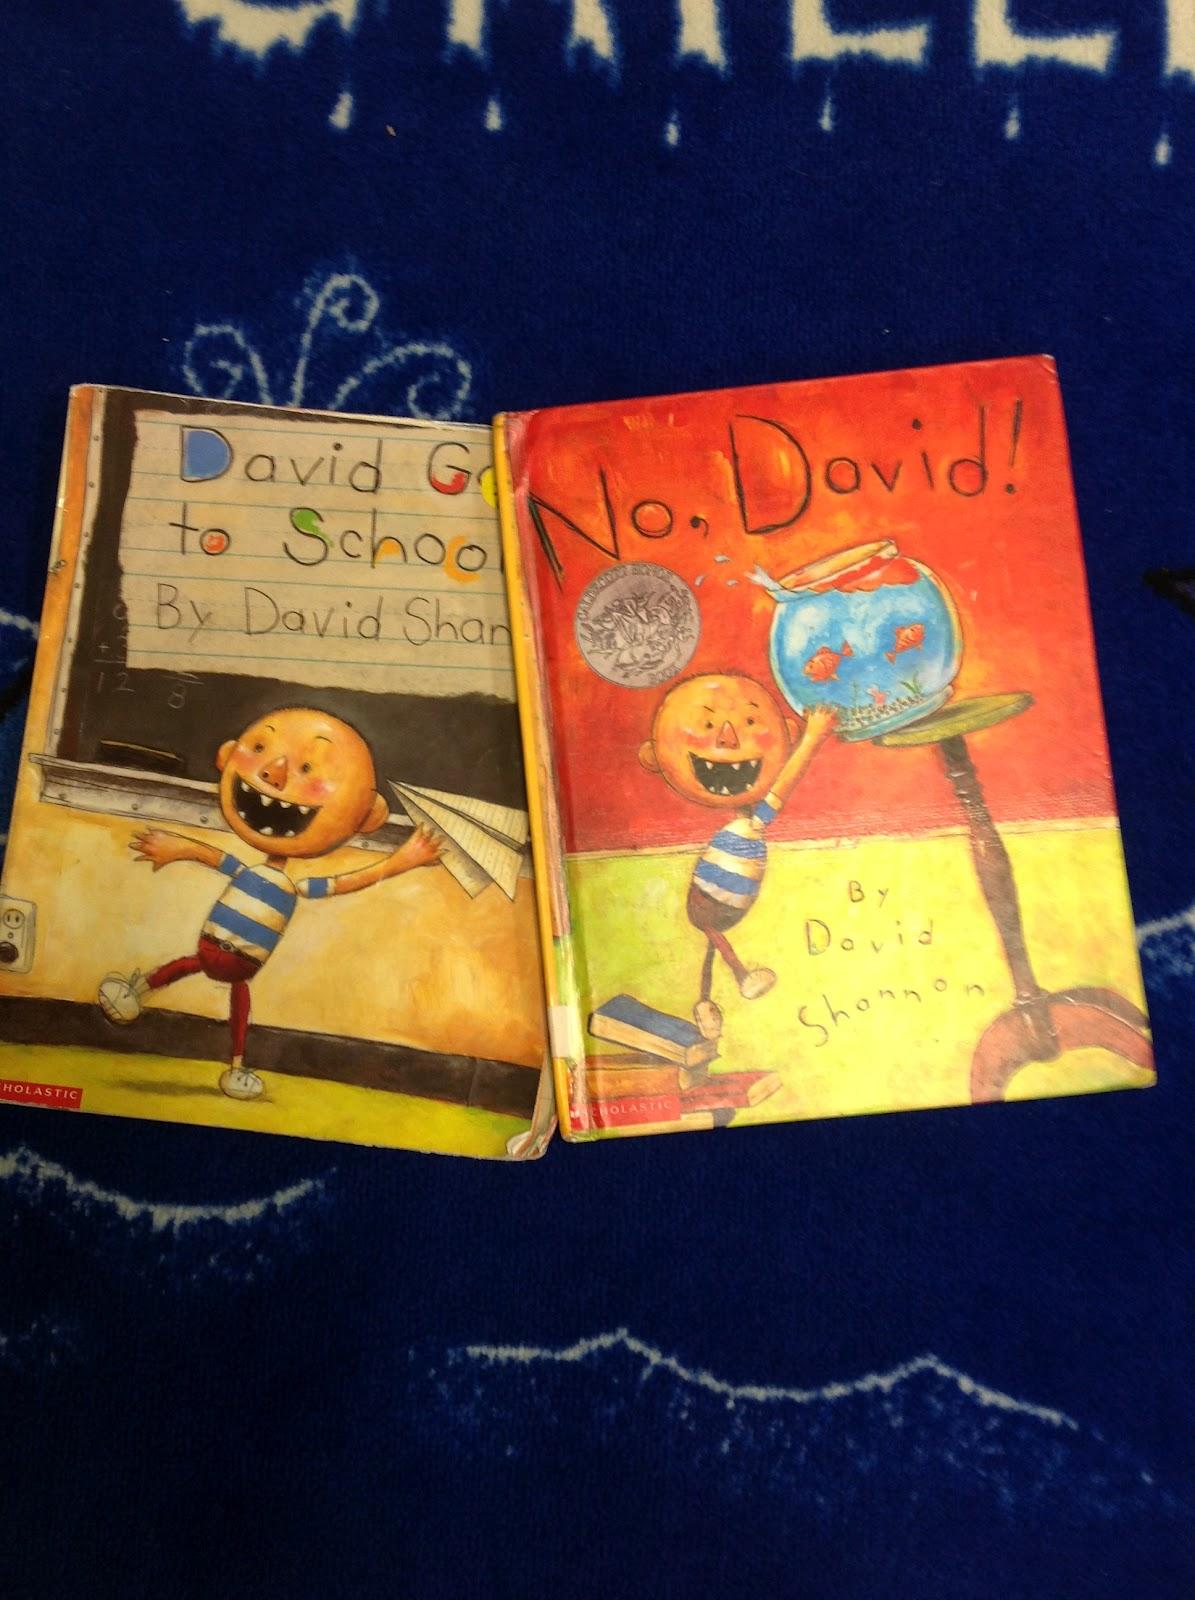 no david book